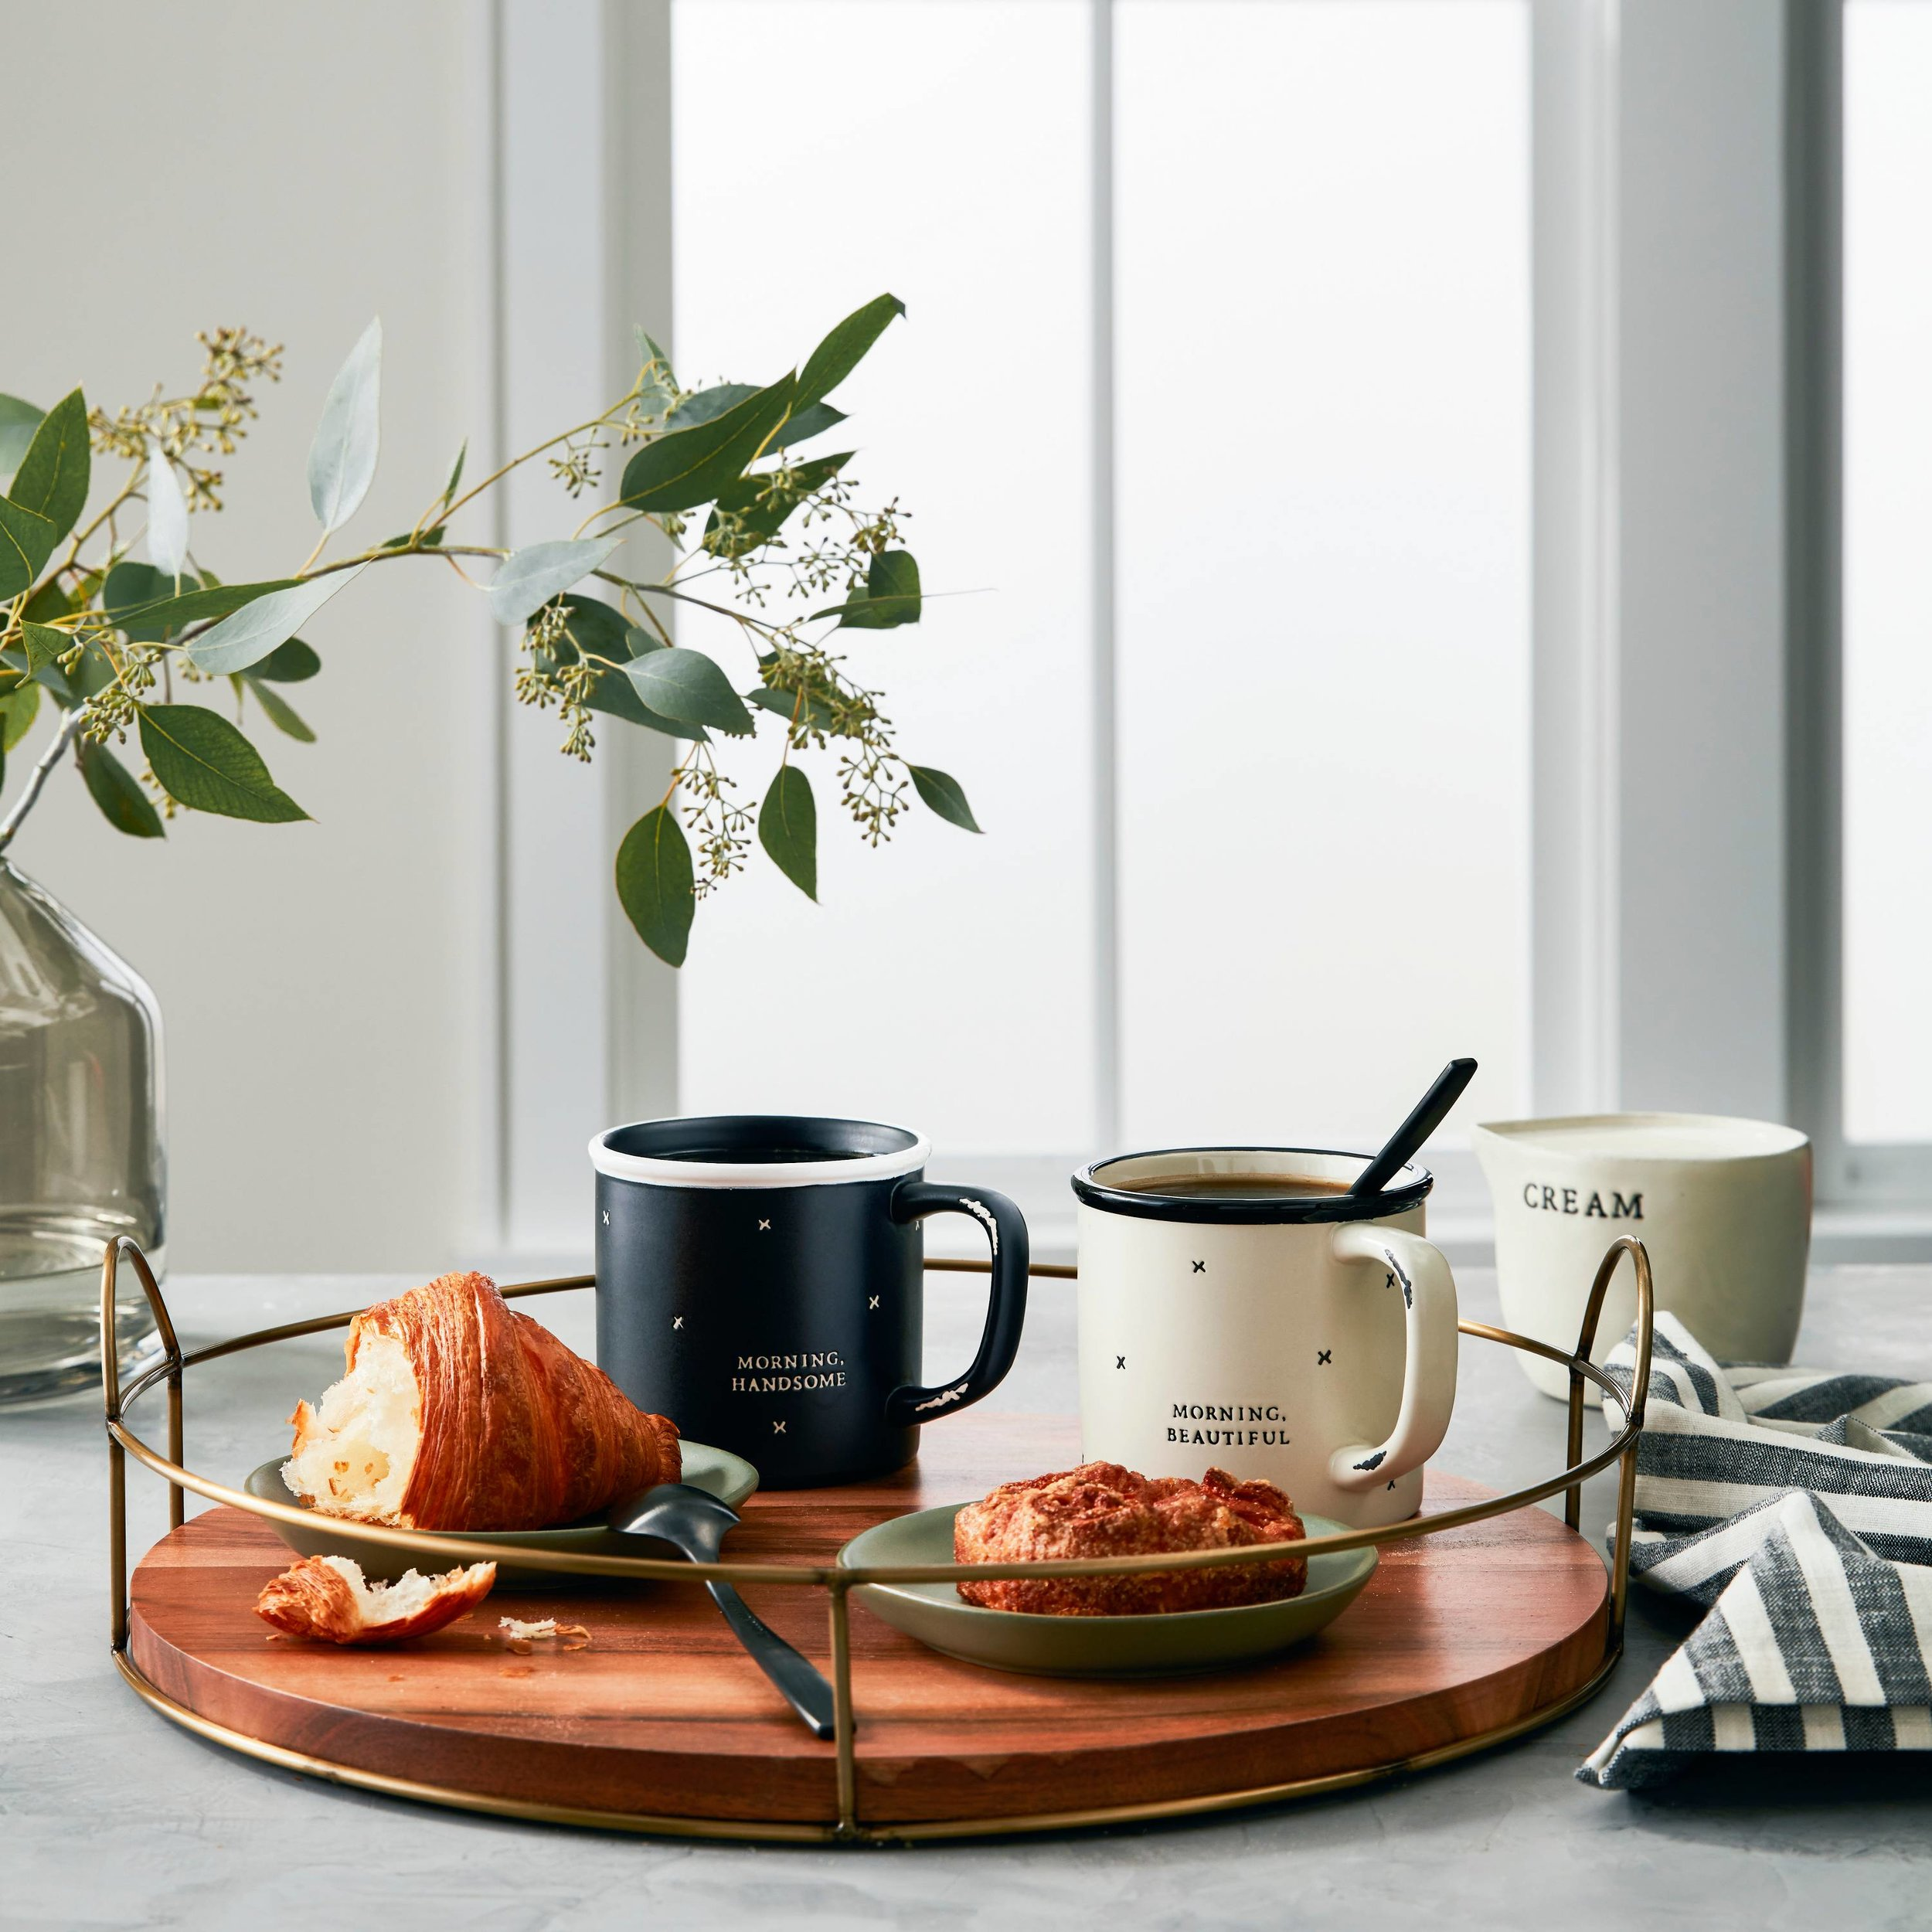 Good morning beautiful and handsome stoneware mugs